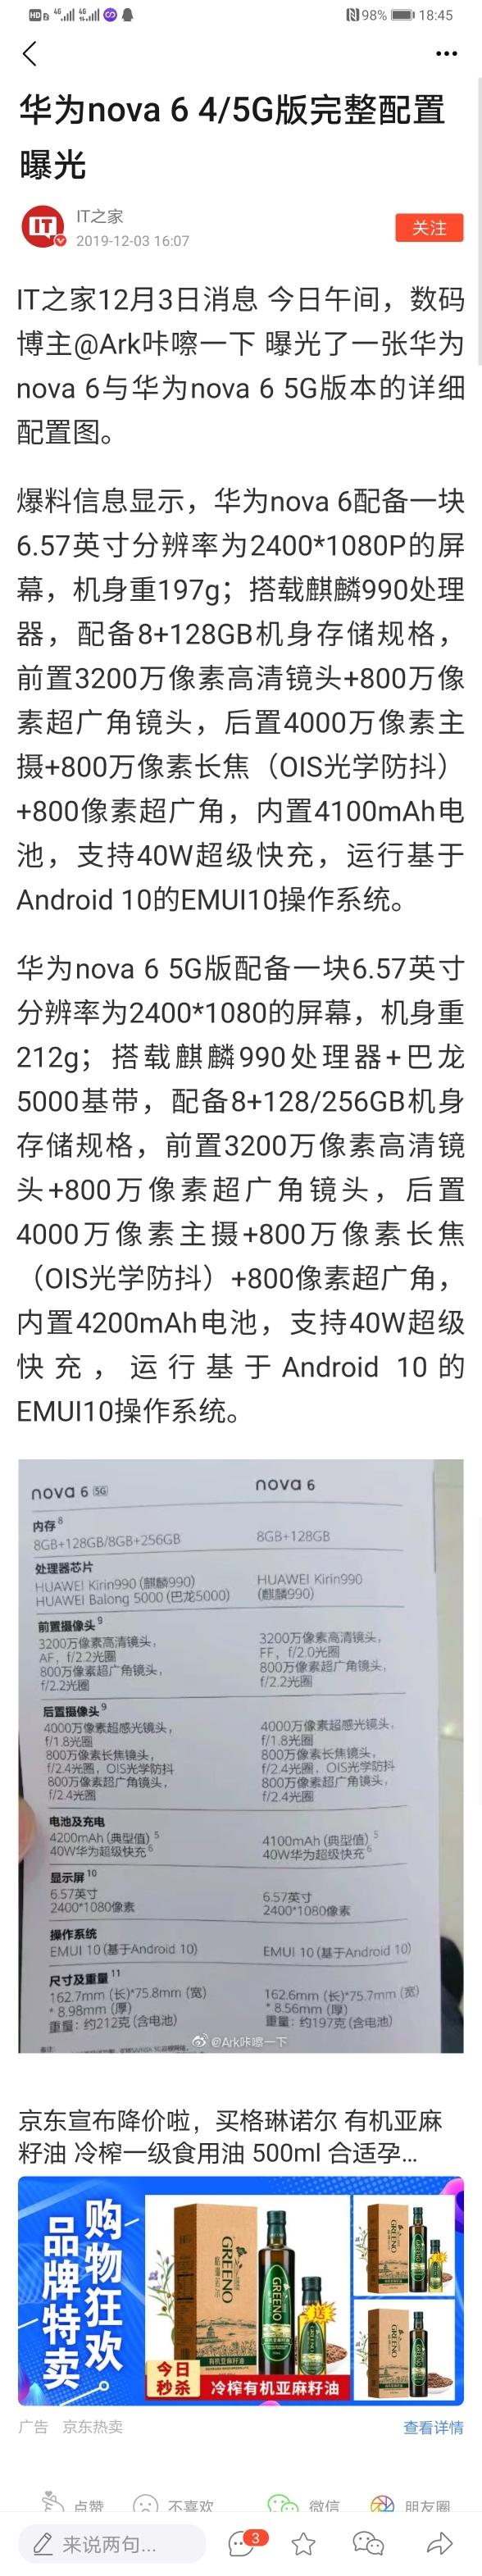 Screenshot_20191203_184512_com.tencent.reading.jpg